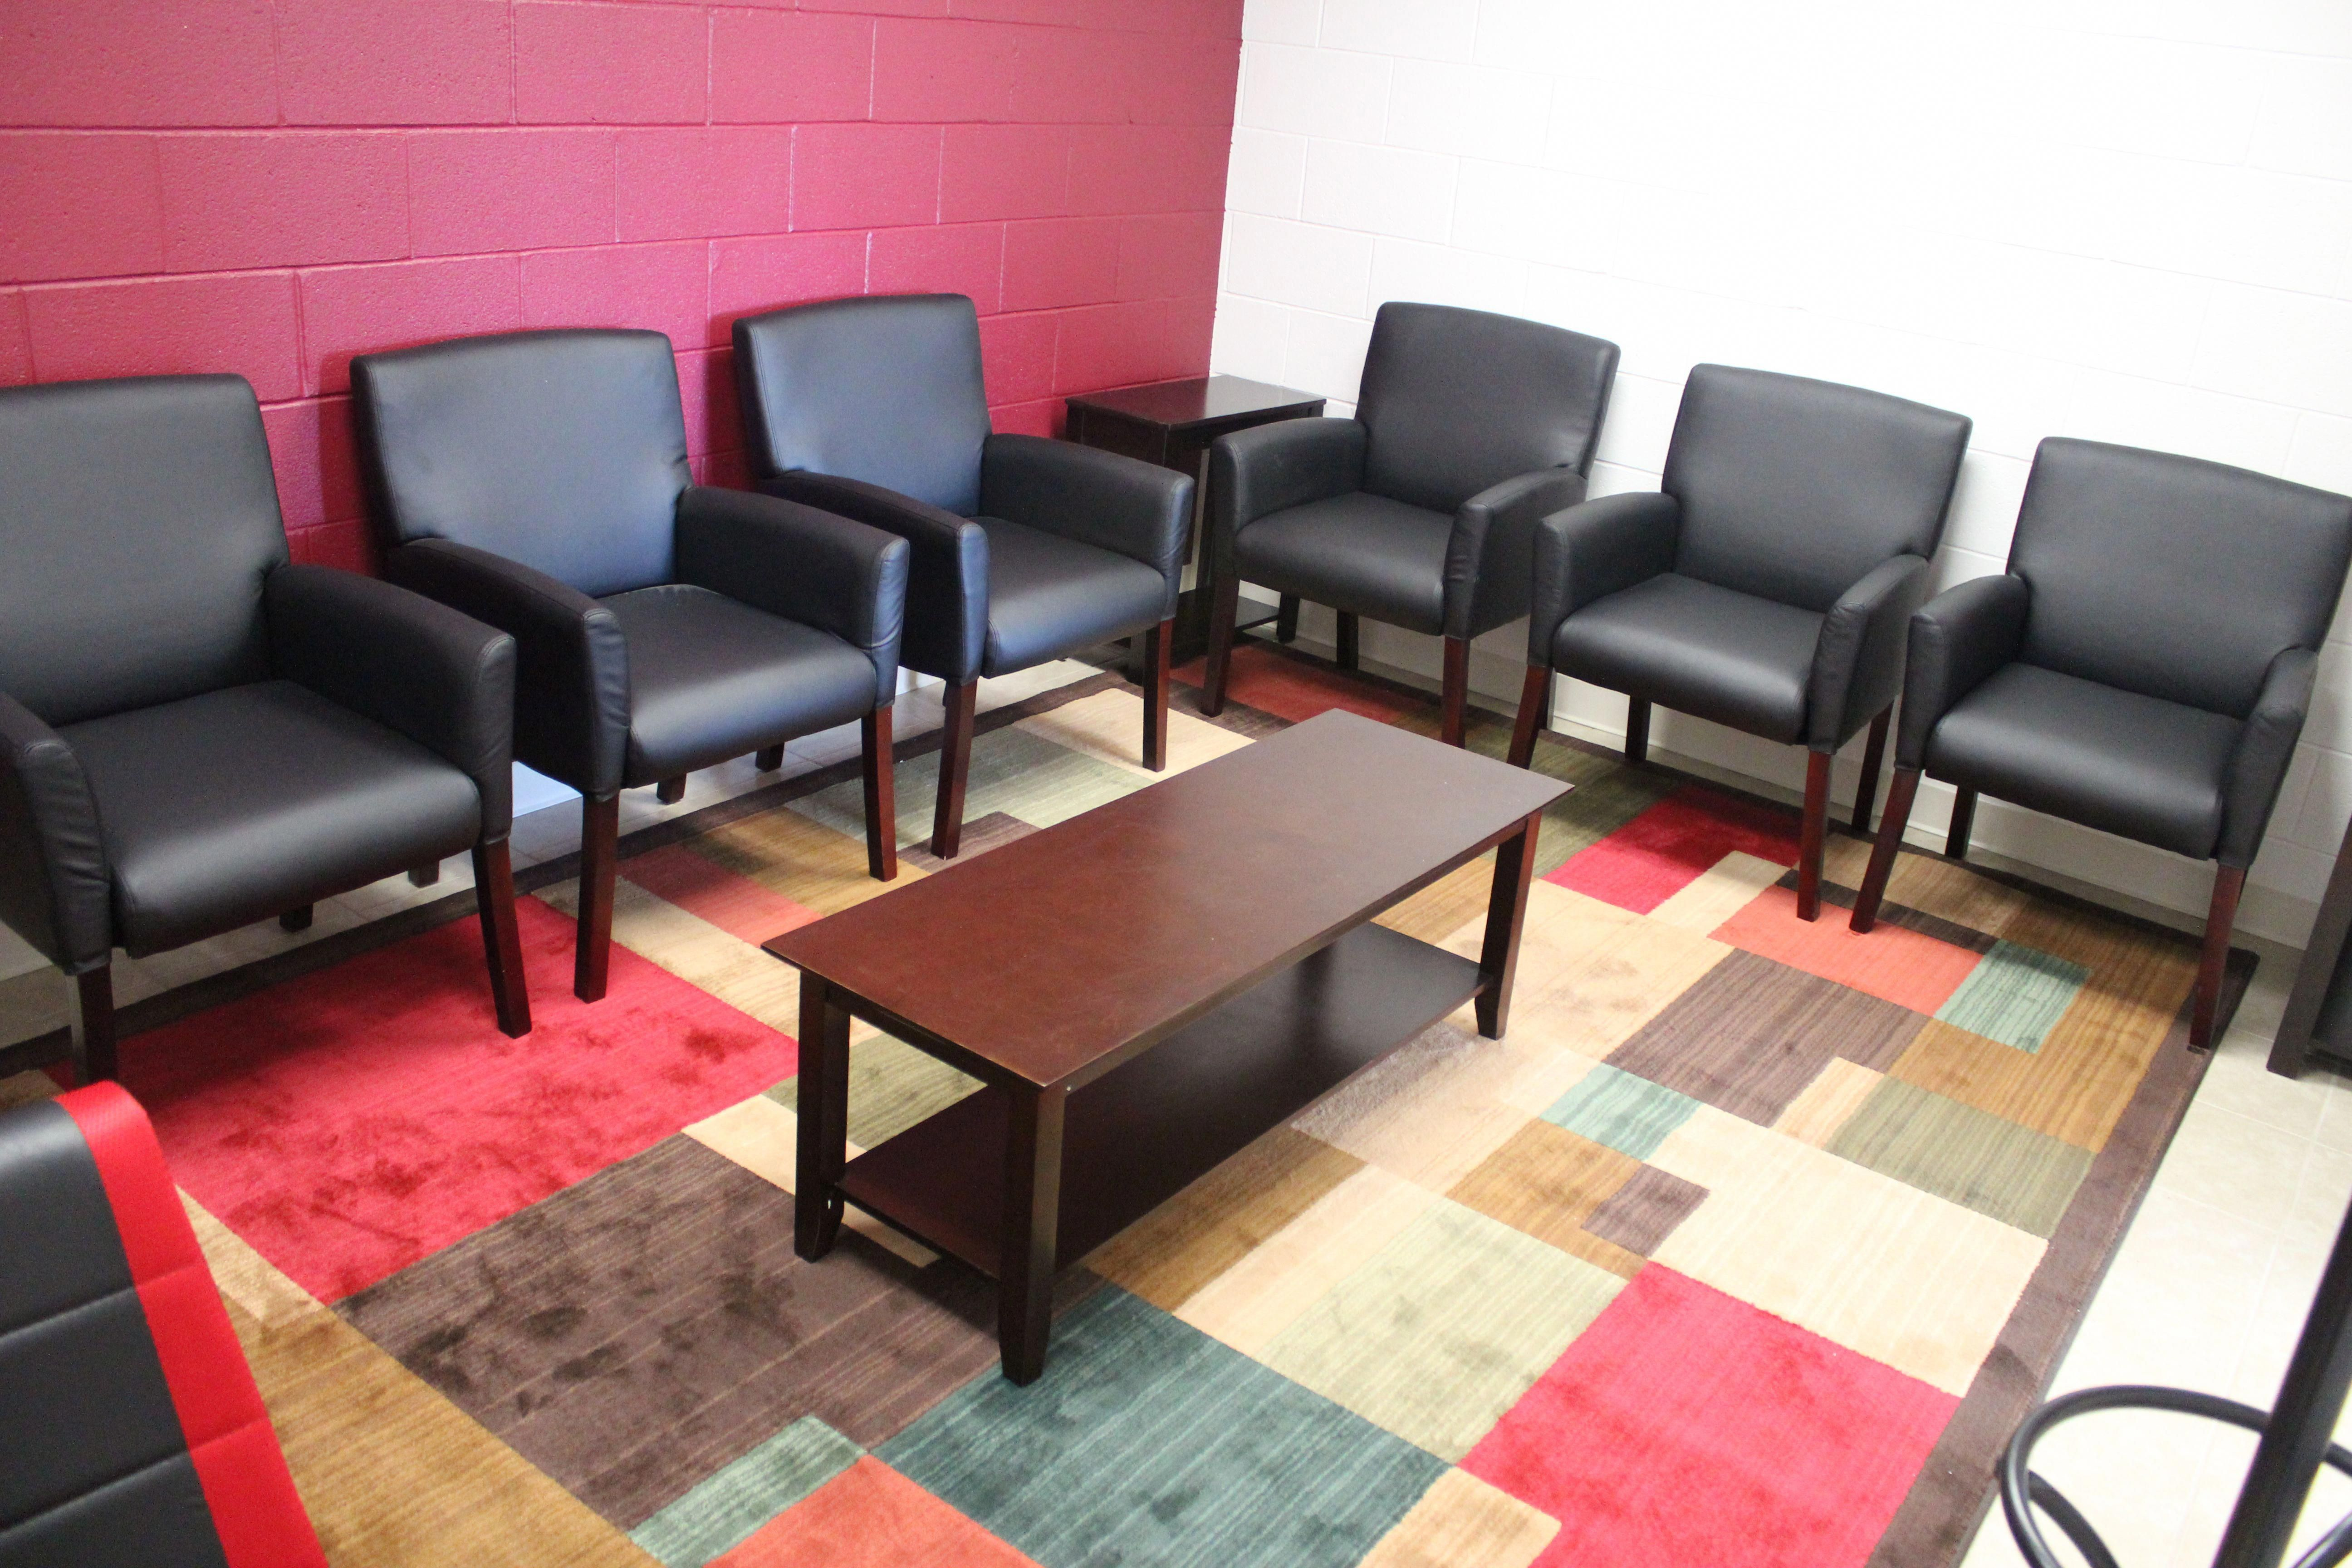 Renovation Ideas by Earnestine Ciffit Office waiting